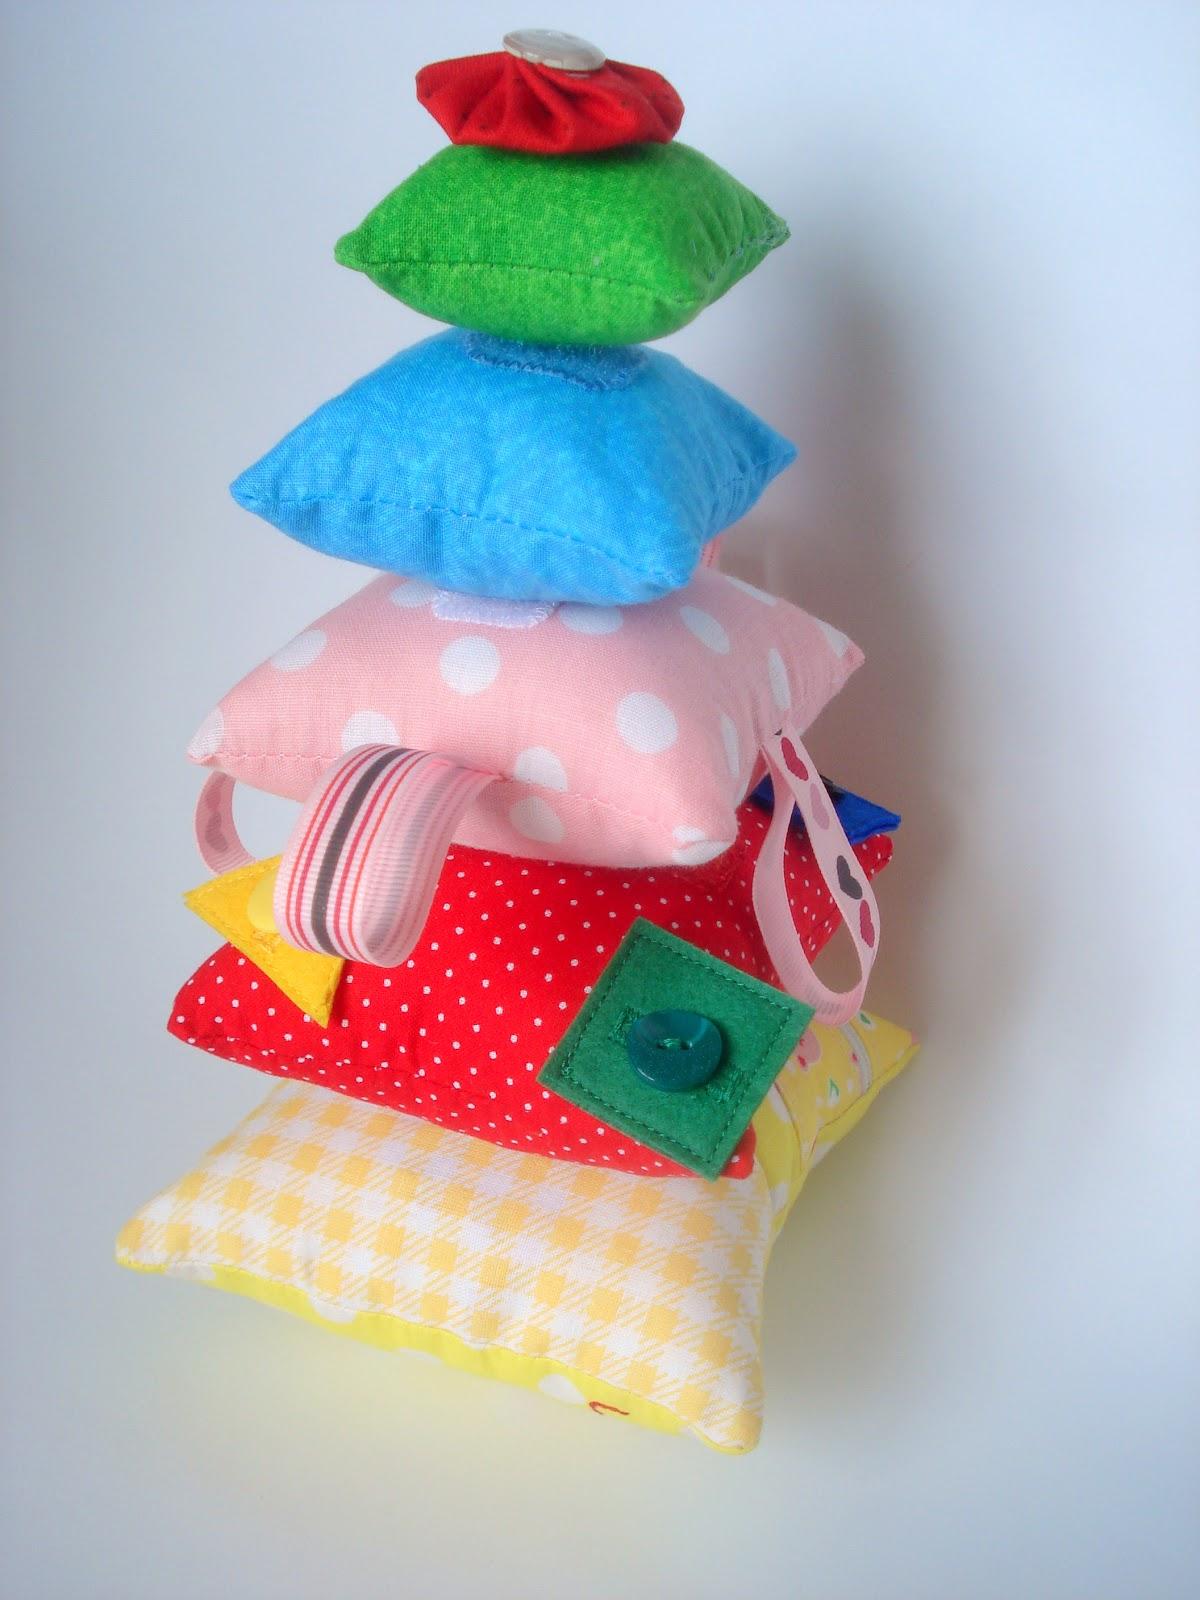 развивающие игрушки развивающая пирамидка